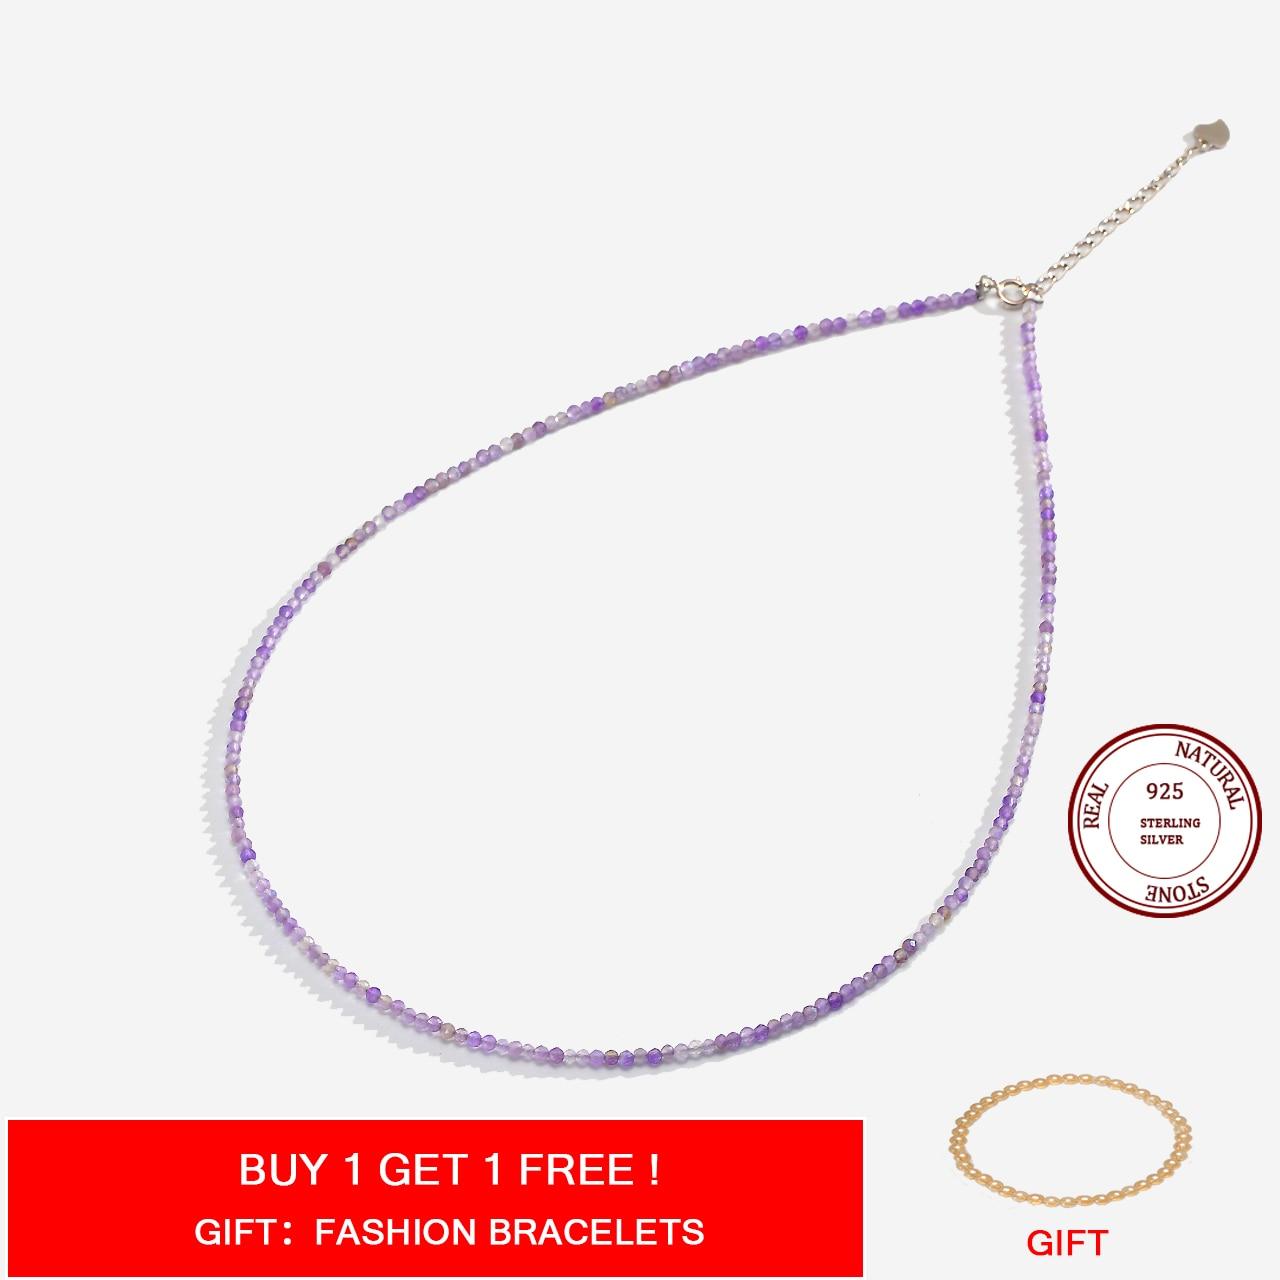 collar-de-piedra-natural-para-mujer-espinela-lapislazul-amazonita-amatista-turmalina-plata-925-2mm-joyeria